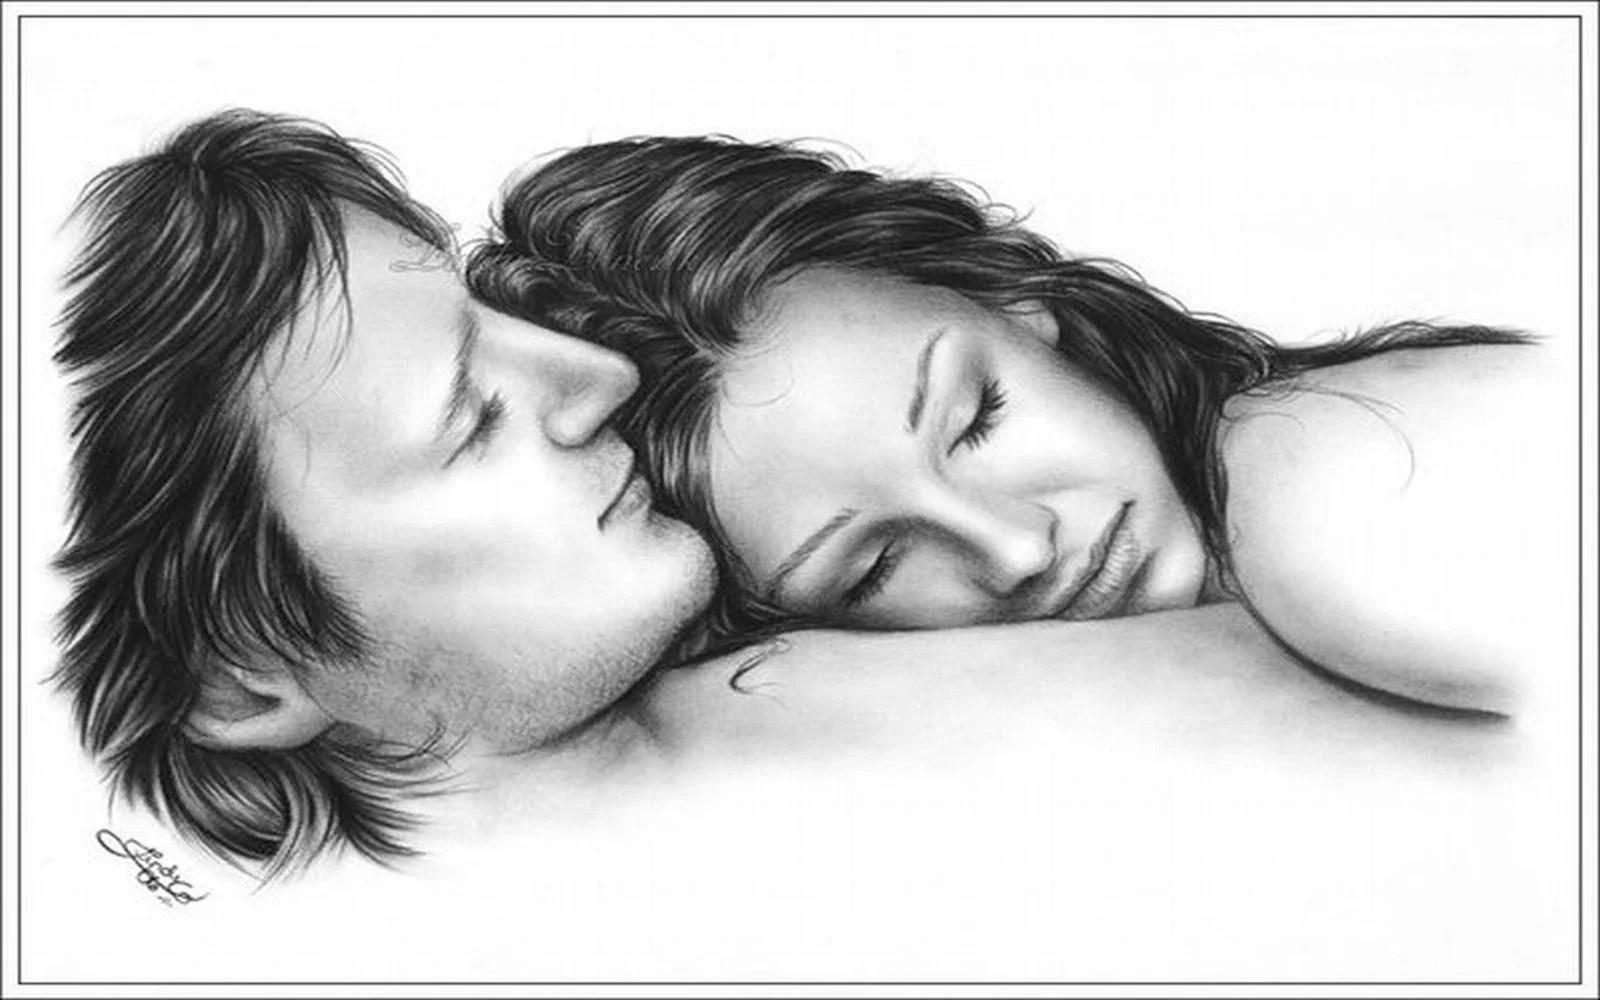 Sad Alone Girl Quotes Wallpapers Hd Cute Love Drawings Pencil Art Hd Romantic Sketch Wallpaper